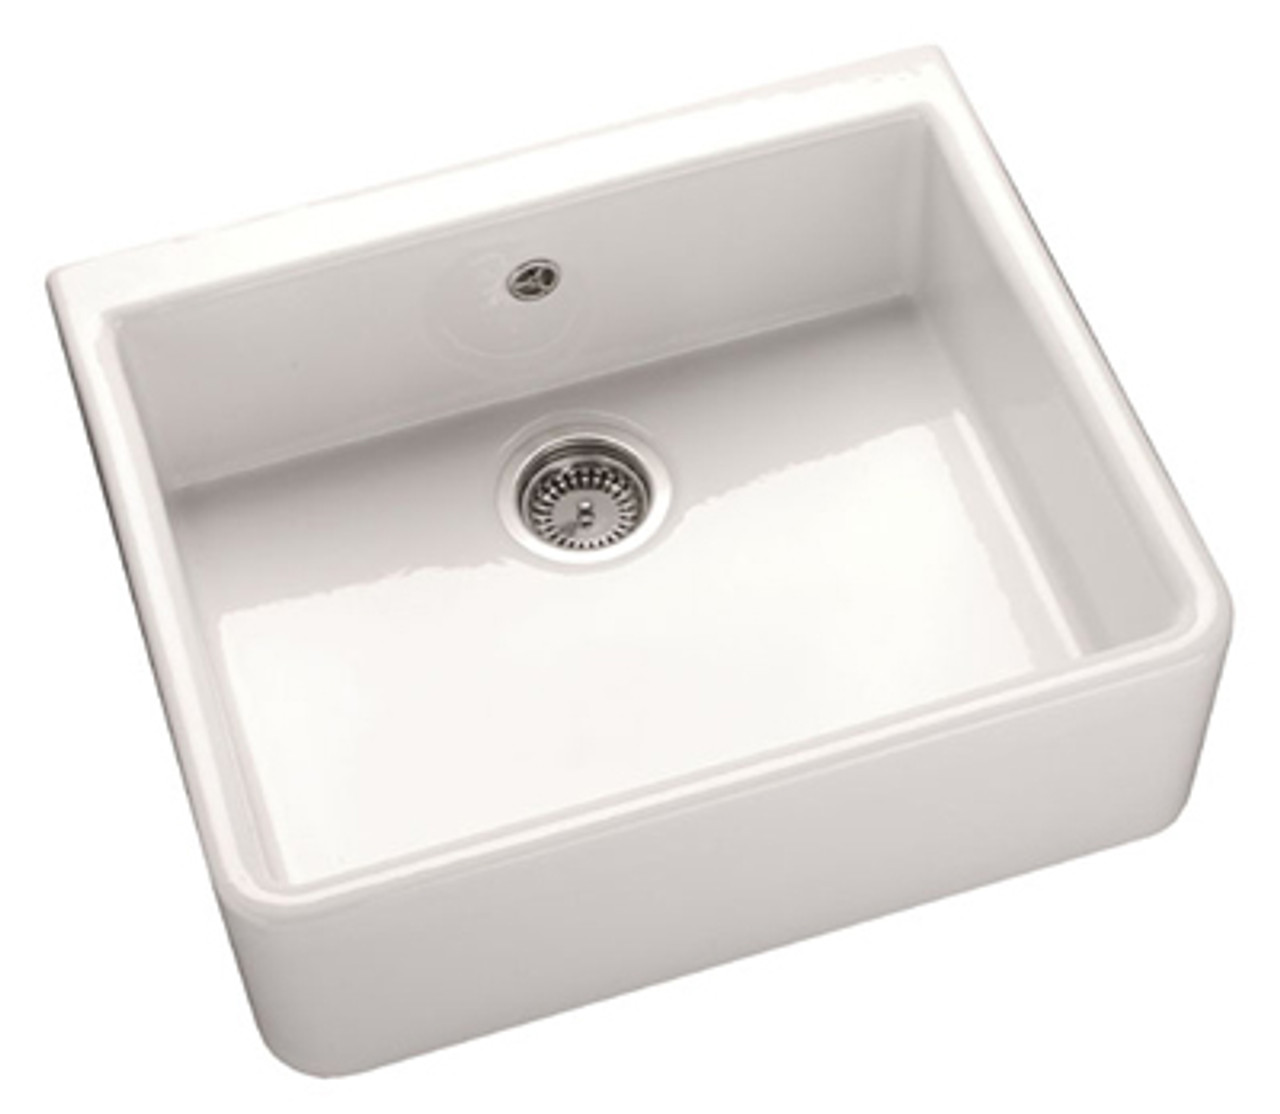 Villeroy Amp Boch Farmhouse Single Bowl 60 Kitchen Sink Sinks